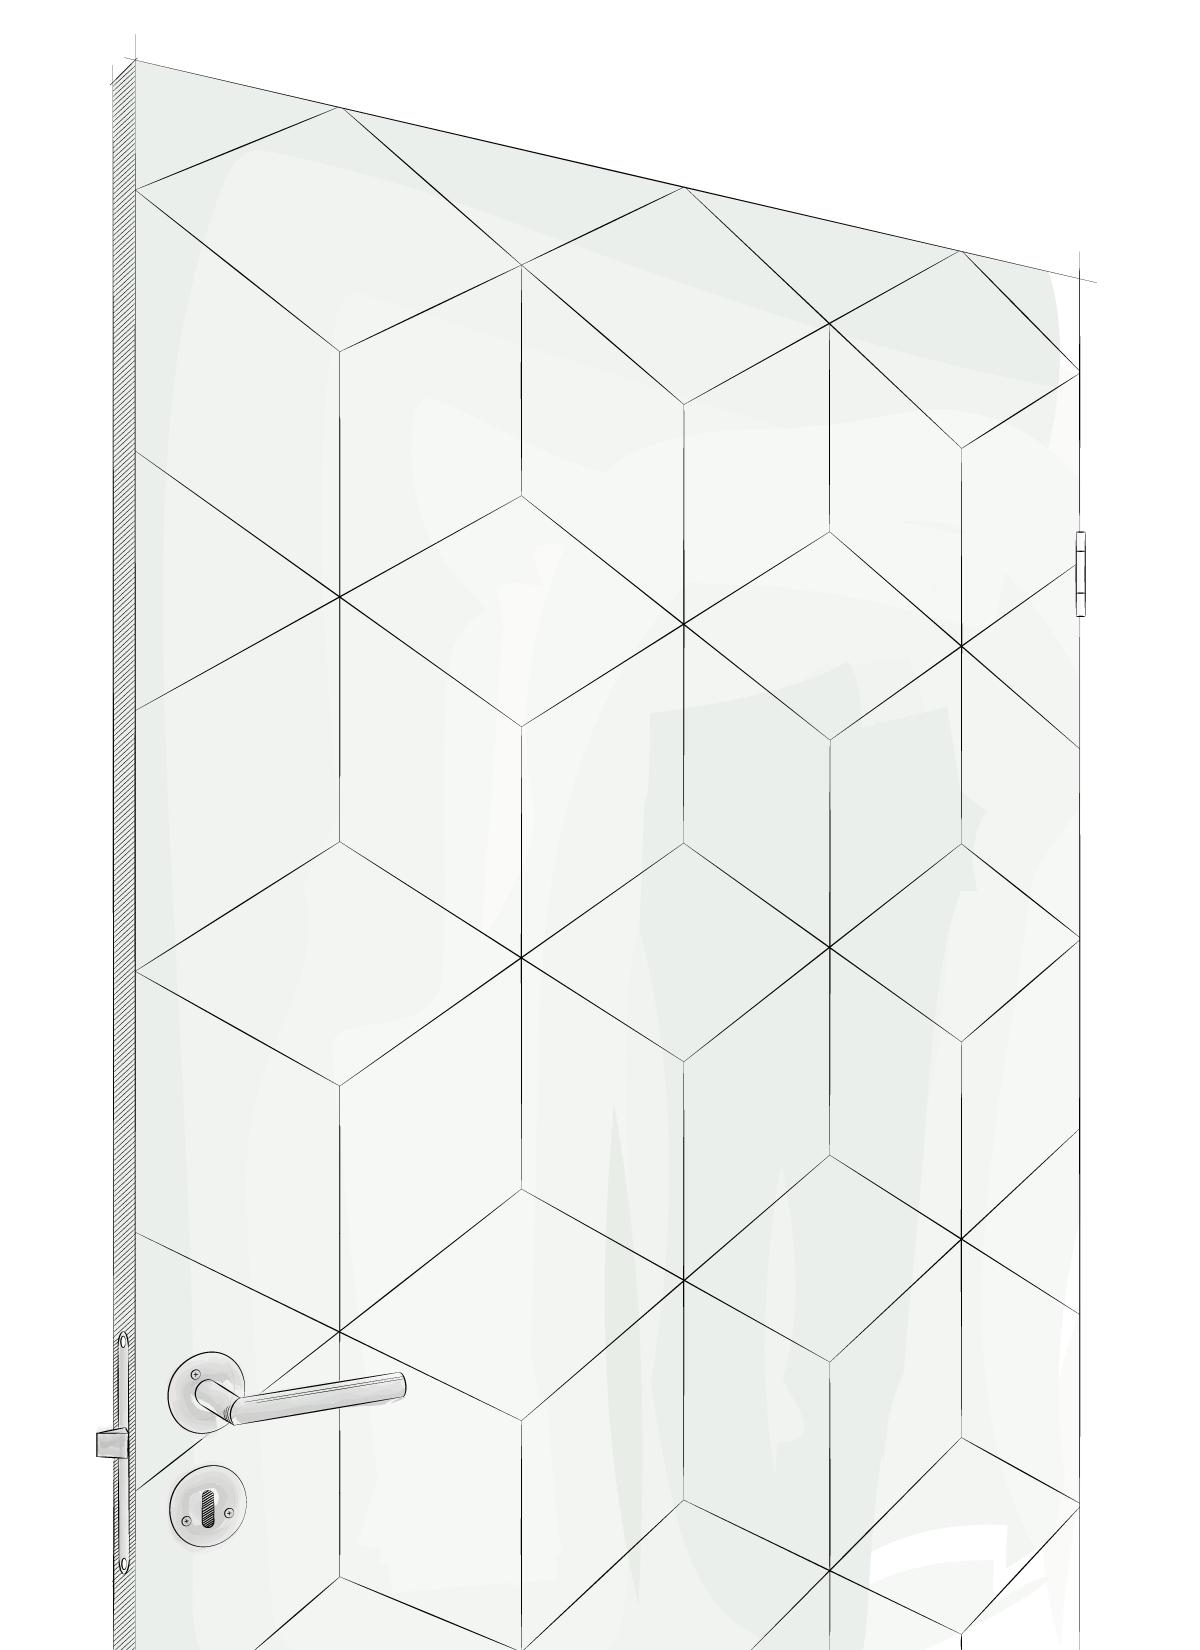 skiss-innerdörr-mönster-handtag